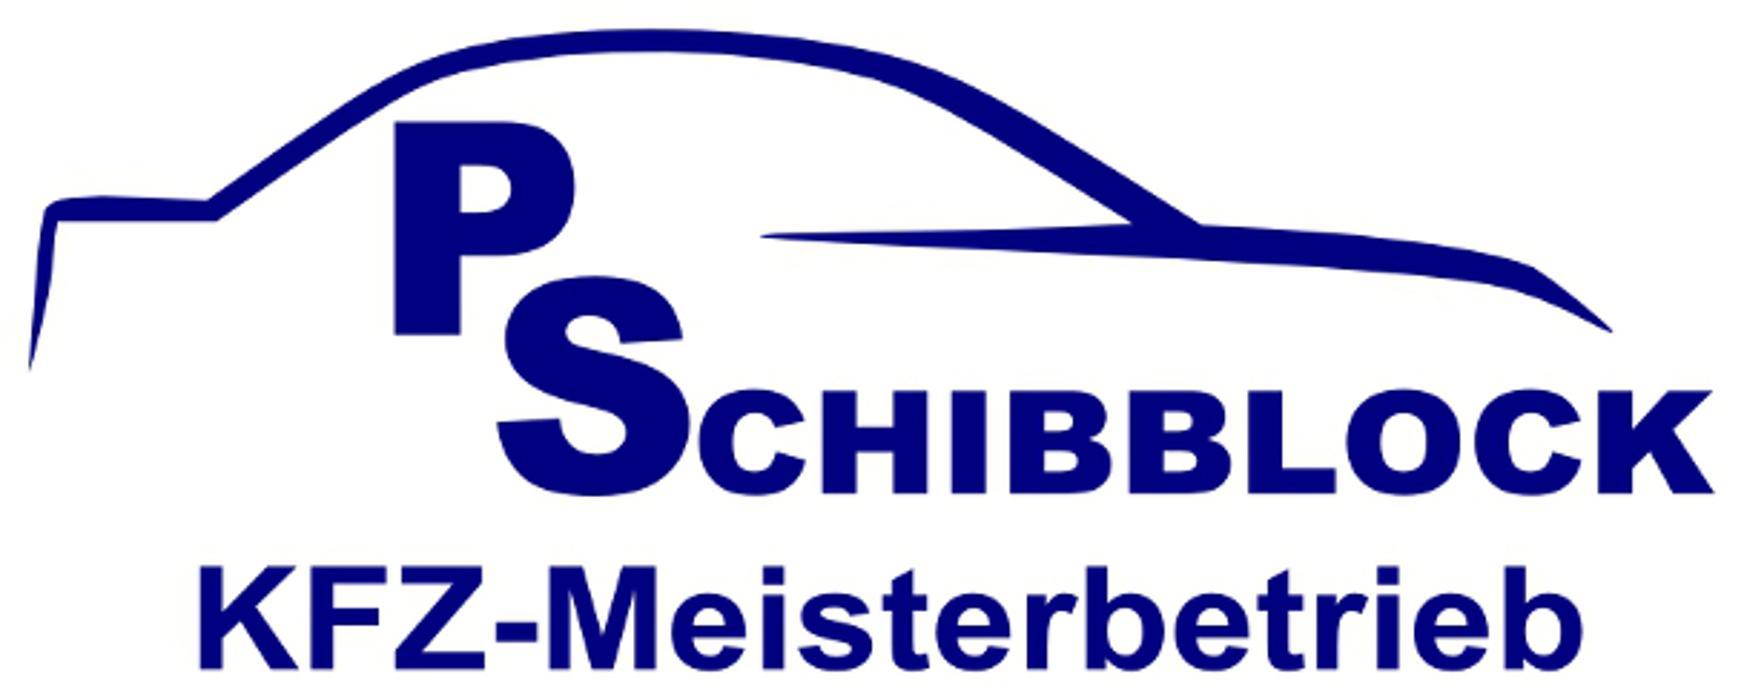 Autohaus P. Schibblock - Kfz Meisterbetrieb